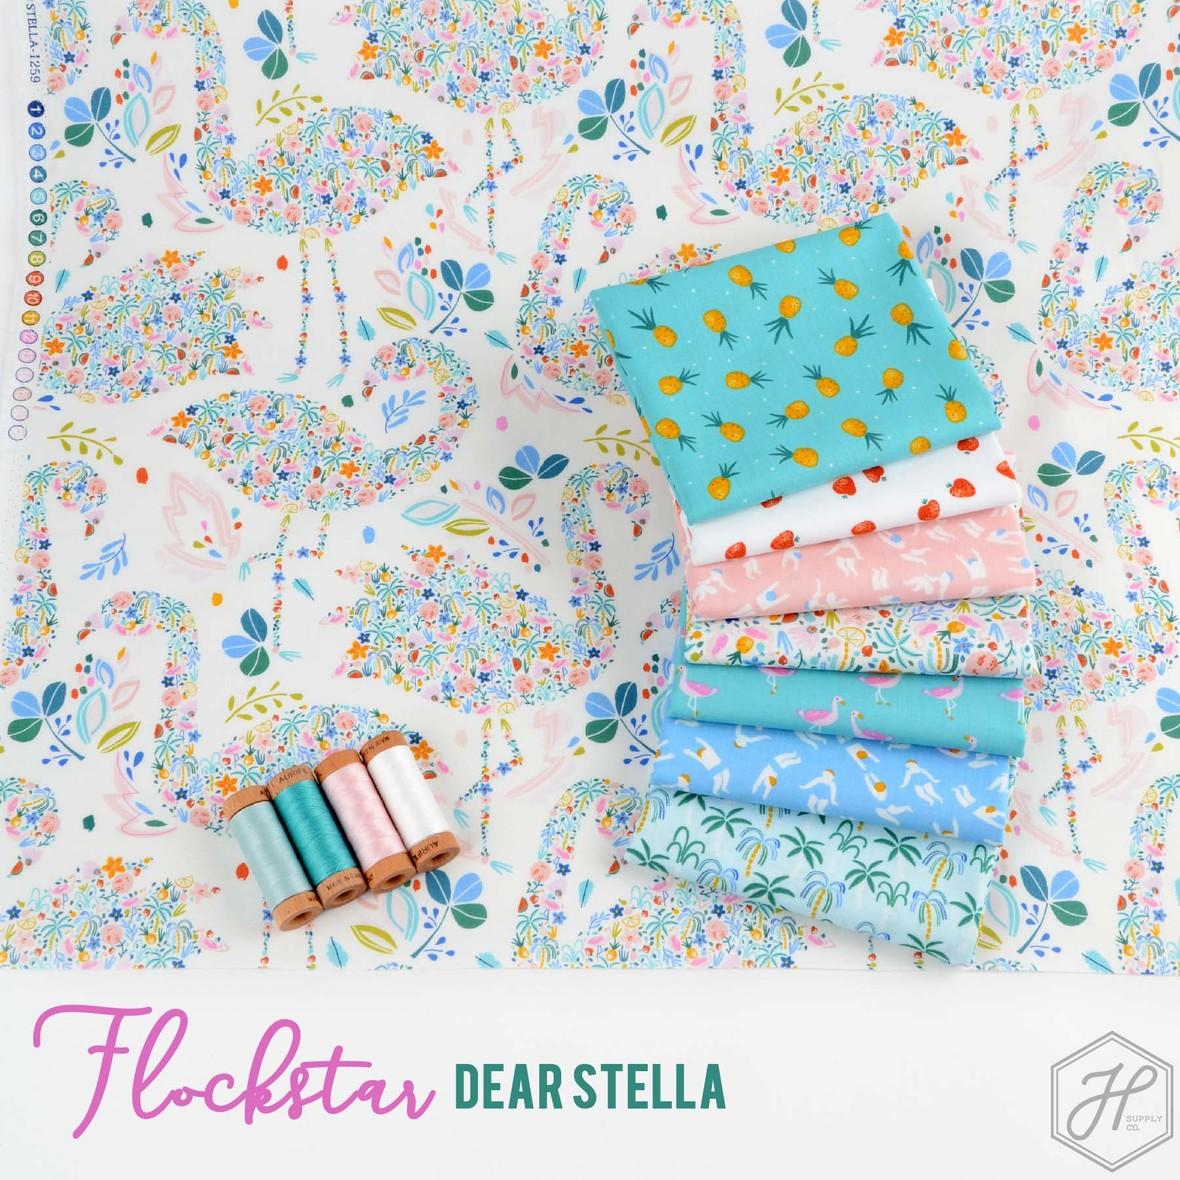 Flockstar Fabric Poster Dear Stella at Hawthorne Supply Co